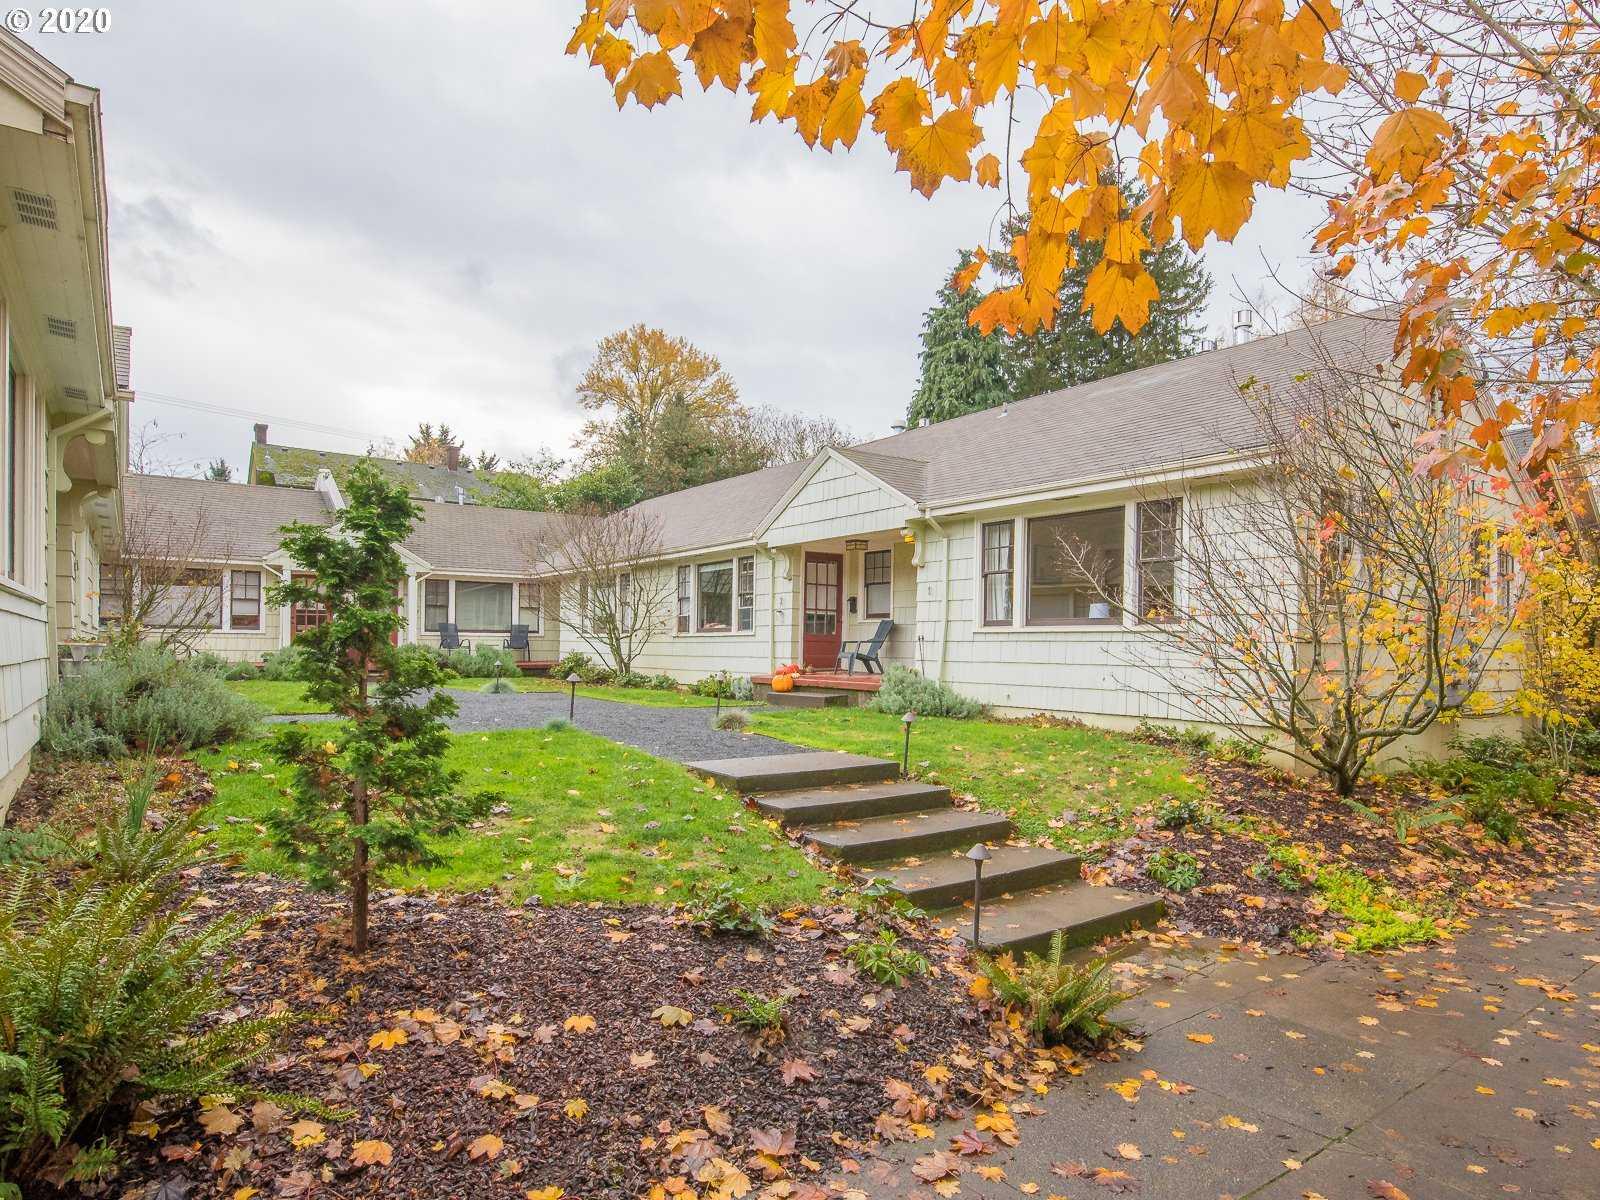 $257,000 - 1Br/1Ba -  for Sale in Richmond / Division, Portland